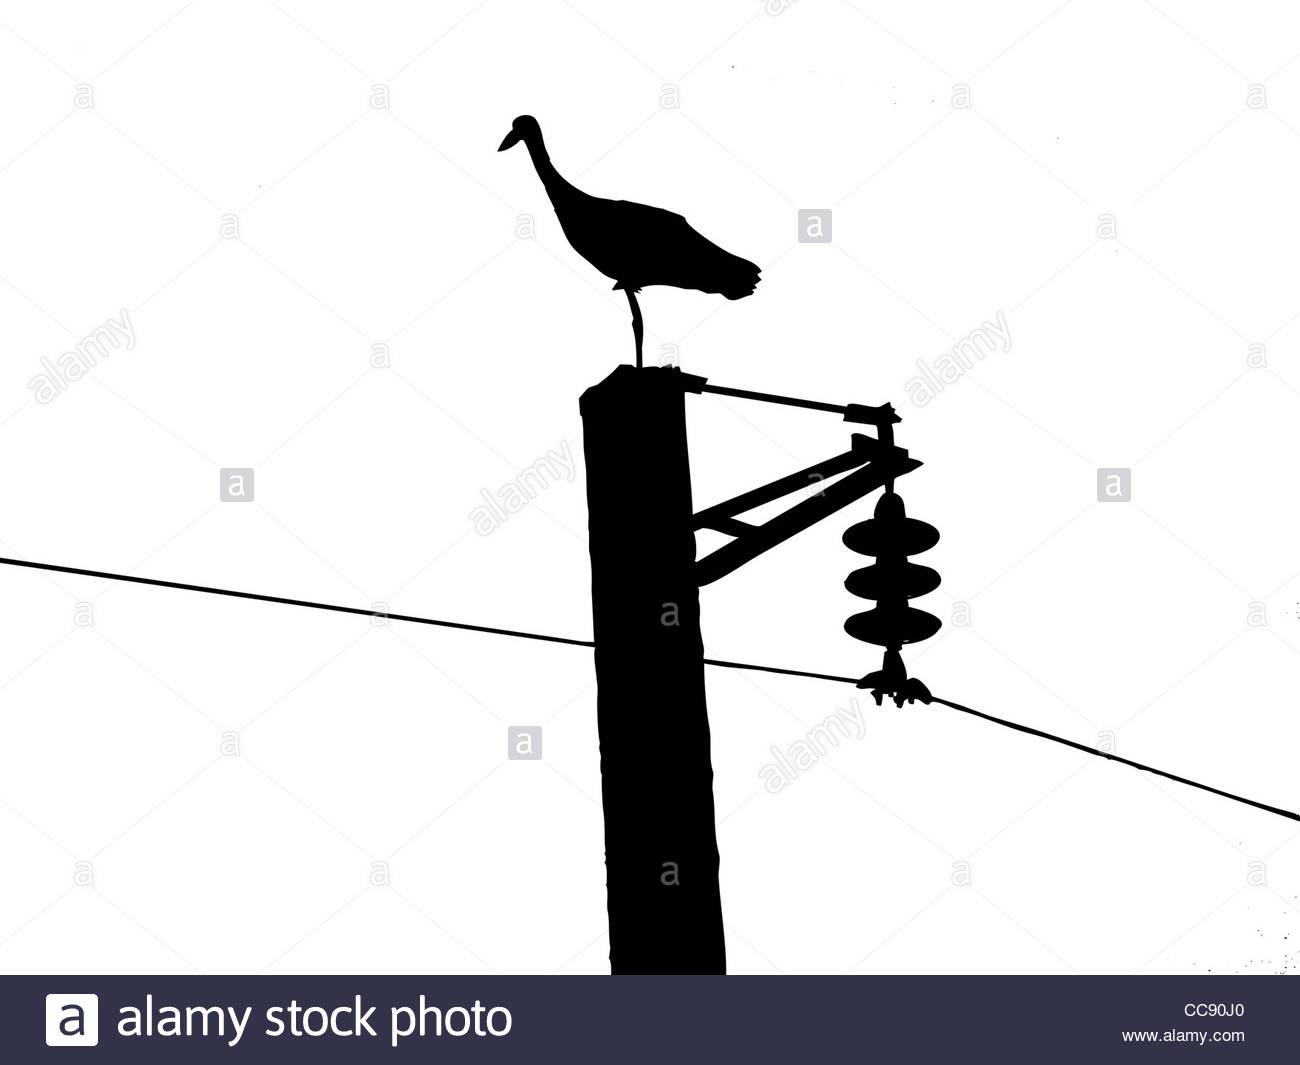 1300x1065 Crane Bird Black And White Stock Photos Amp Images